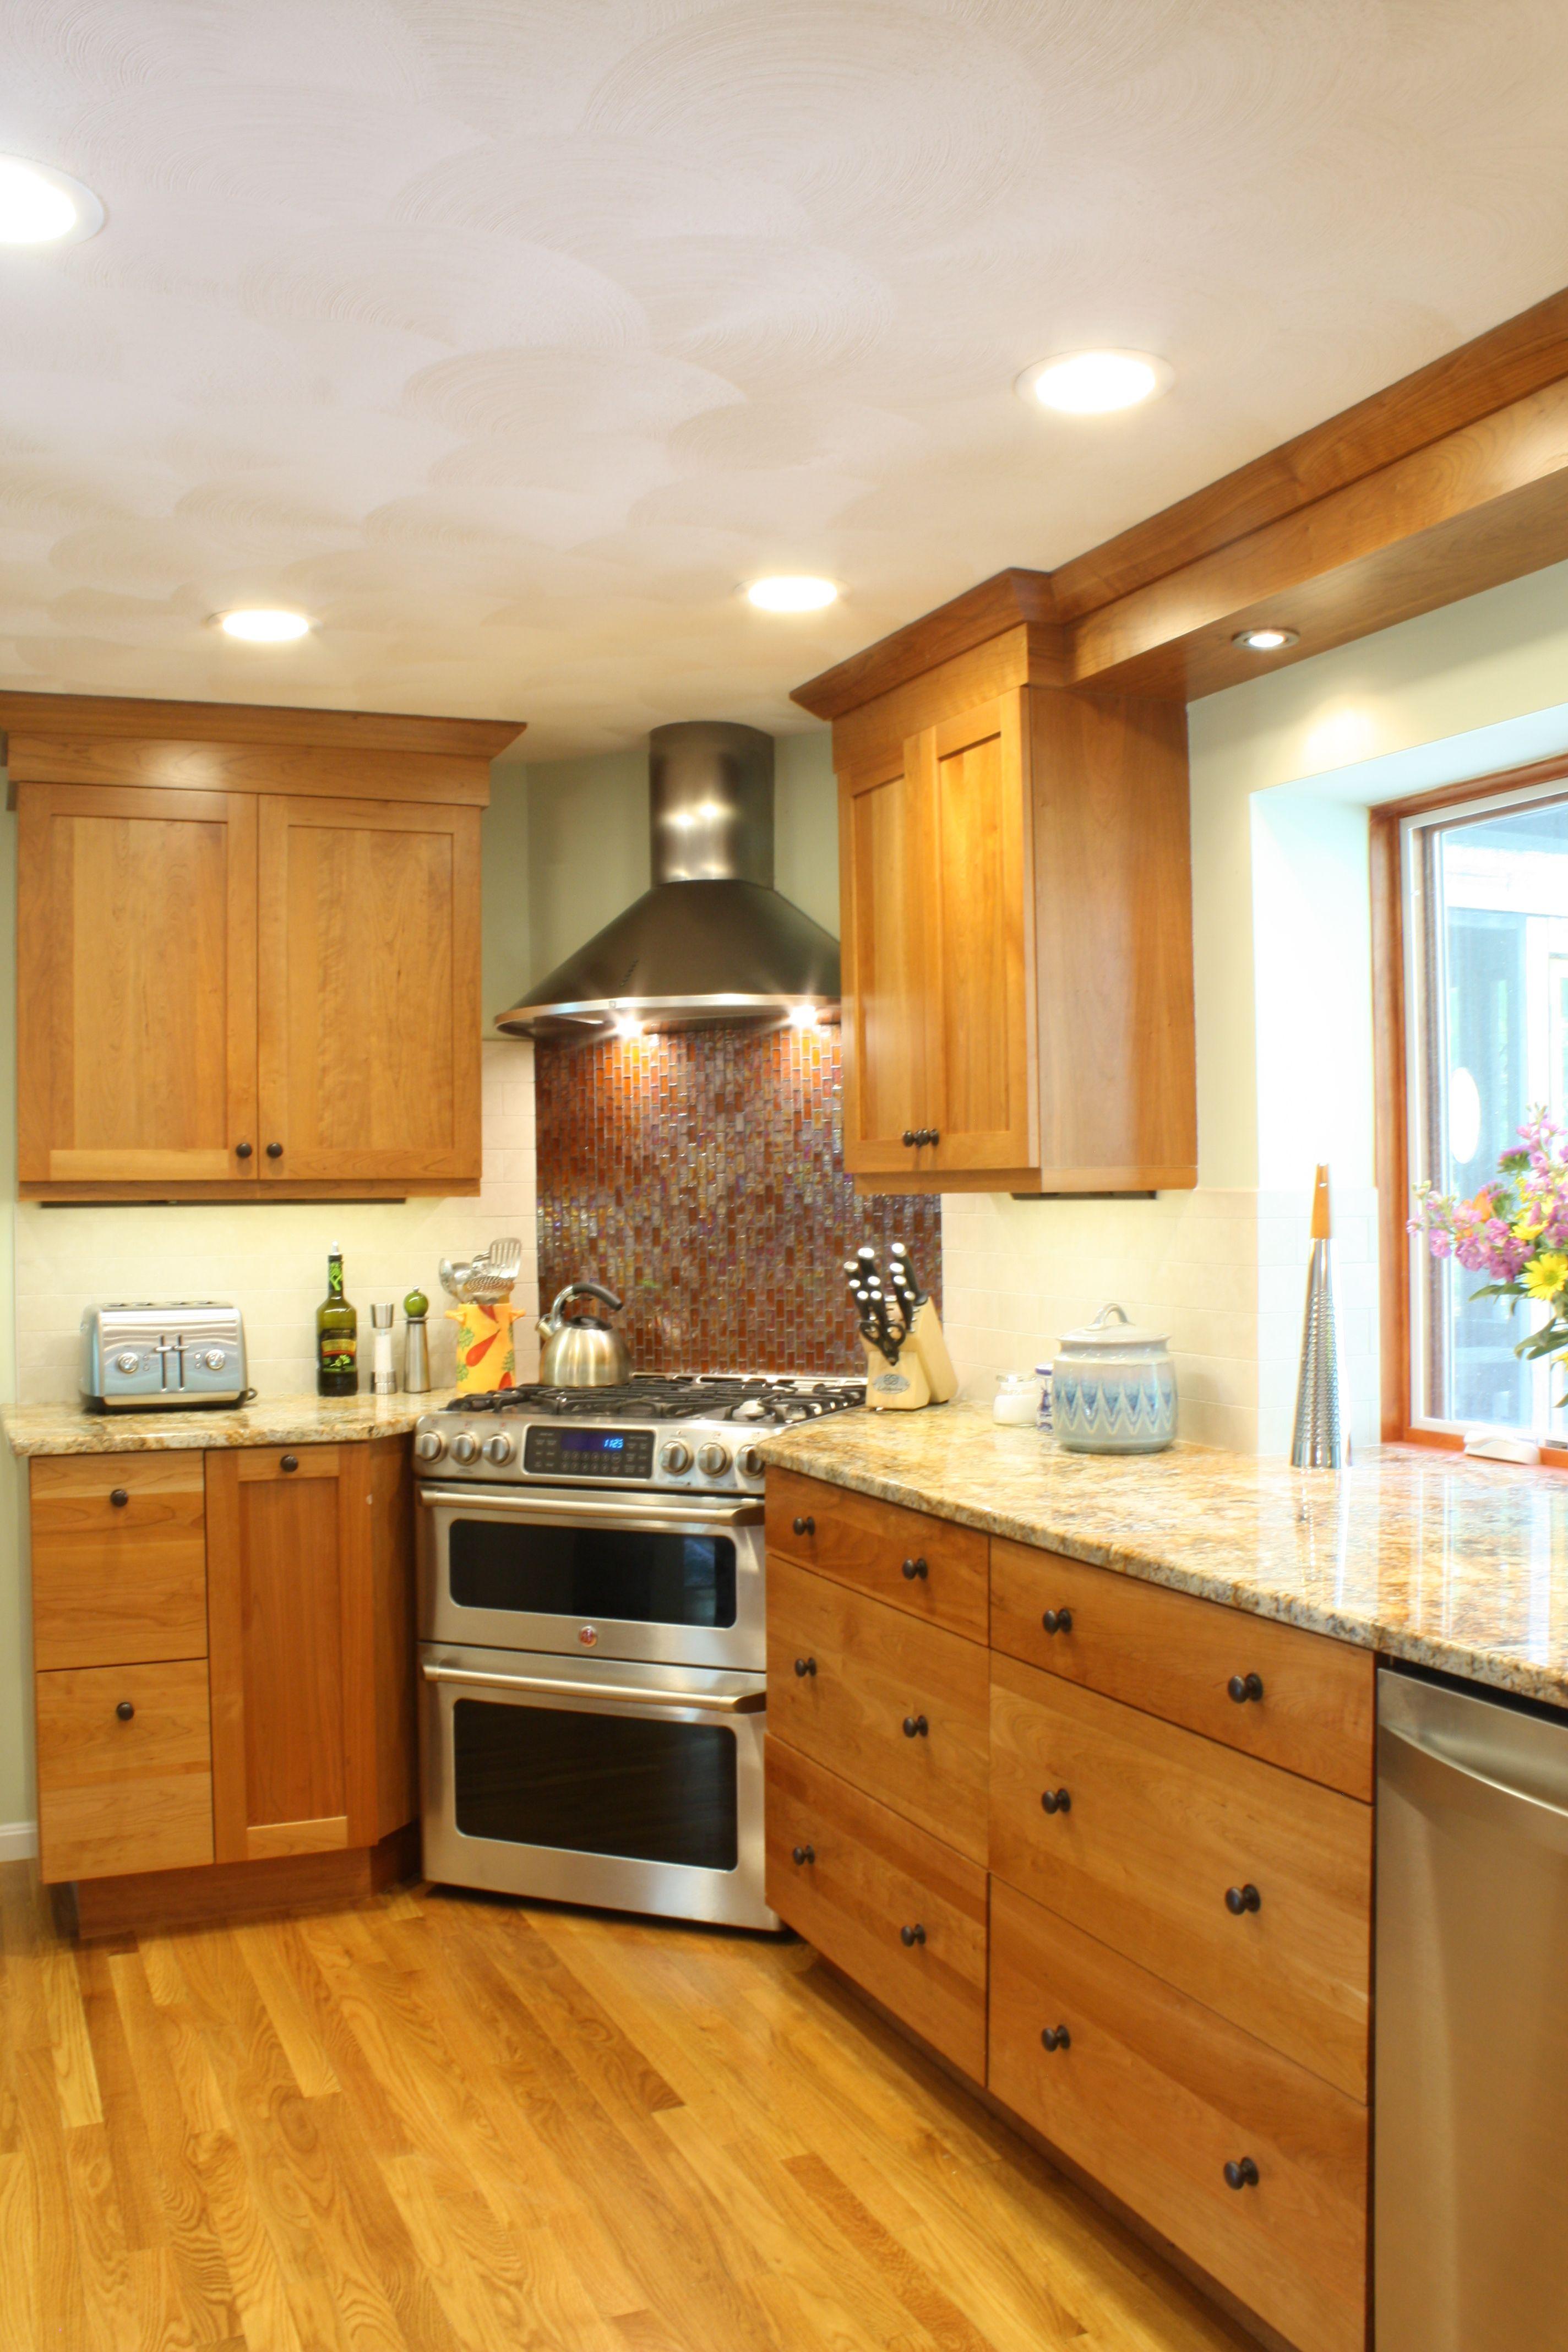 Best Cherry Wood Kitchen Corner Stove And Corner Sink 400 x 300